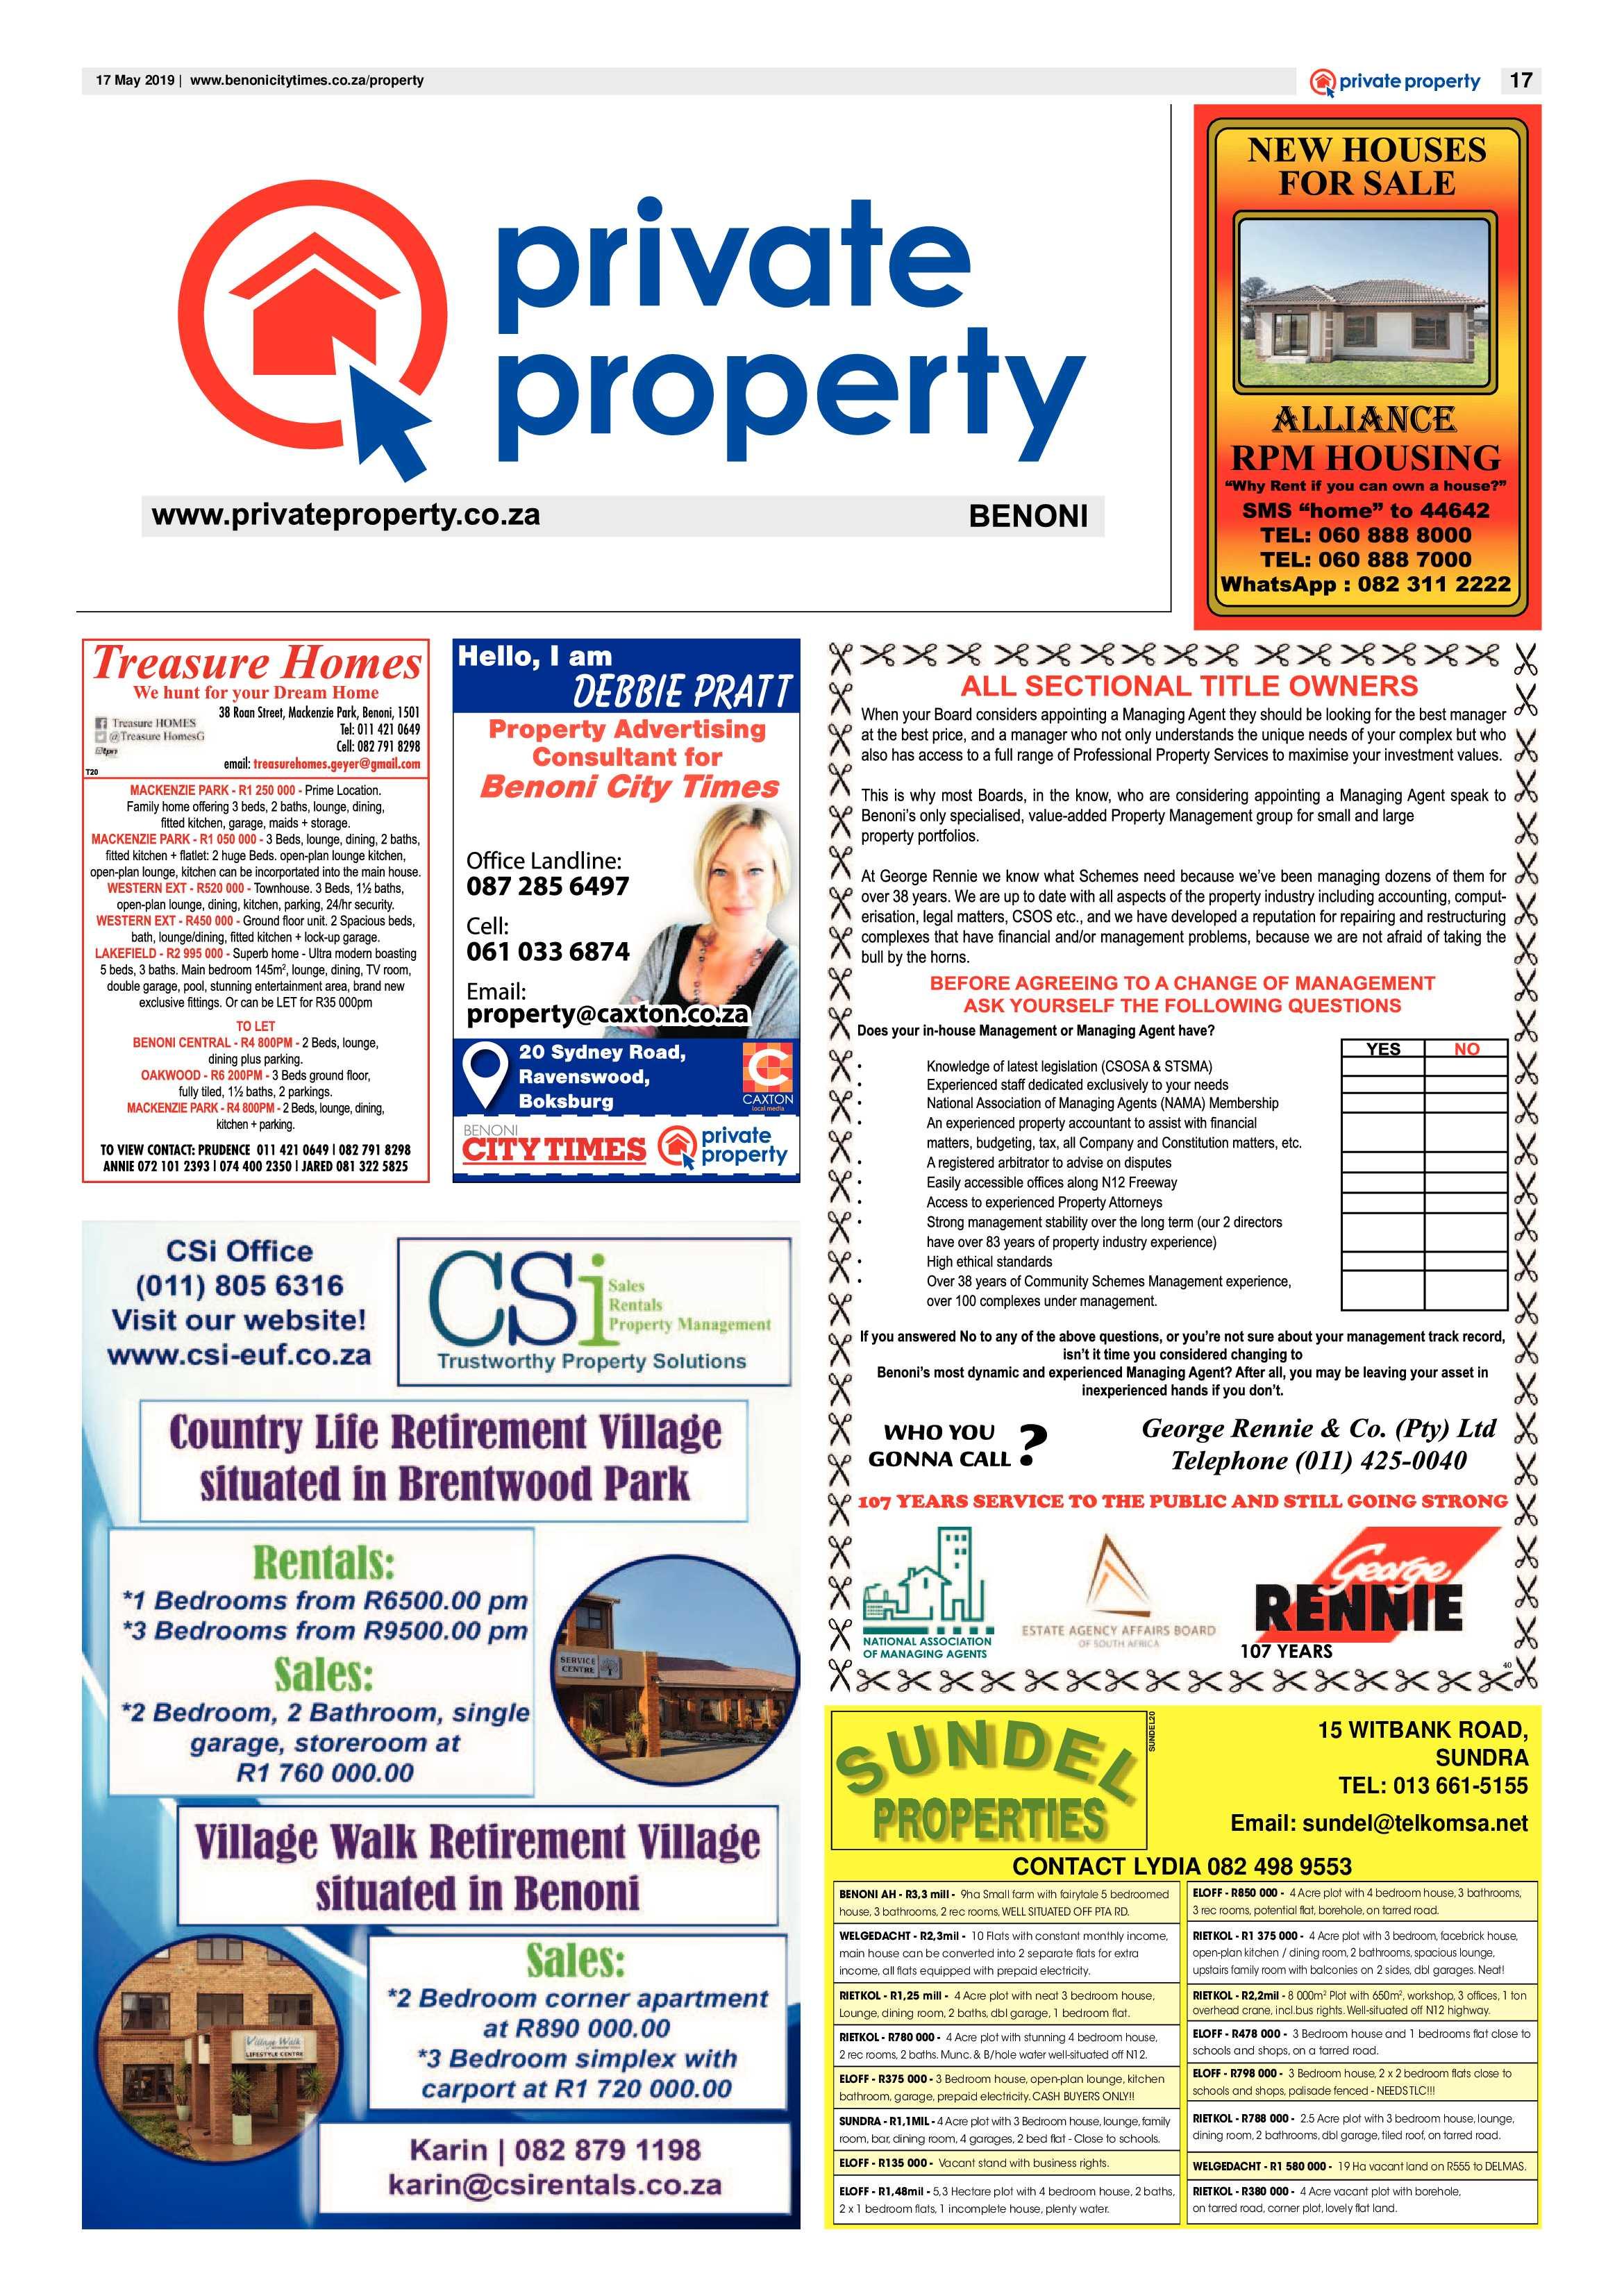 Benoni City Times 16 May 2019 | Benoni City Times